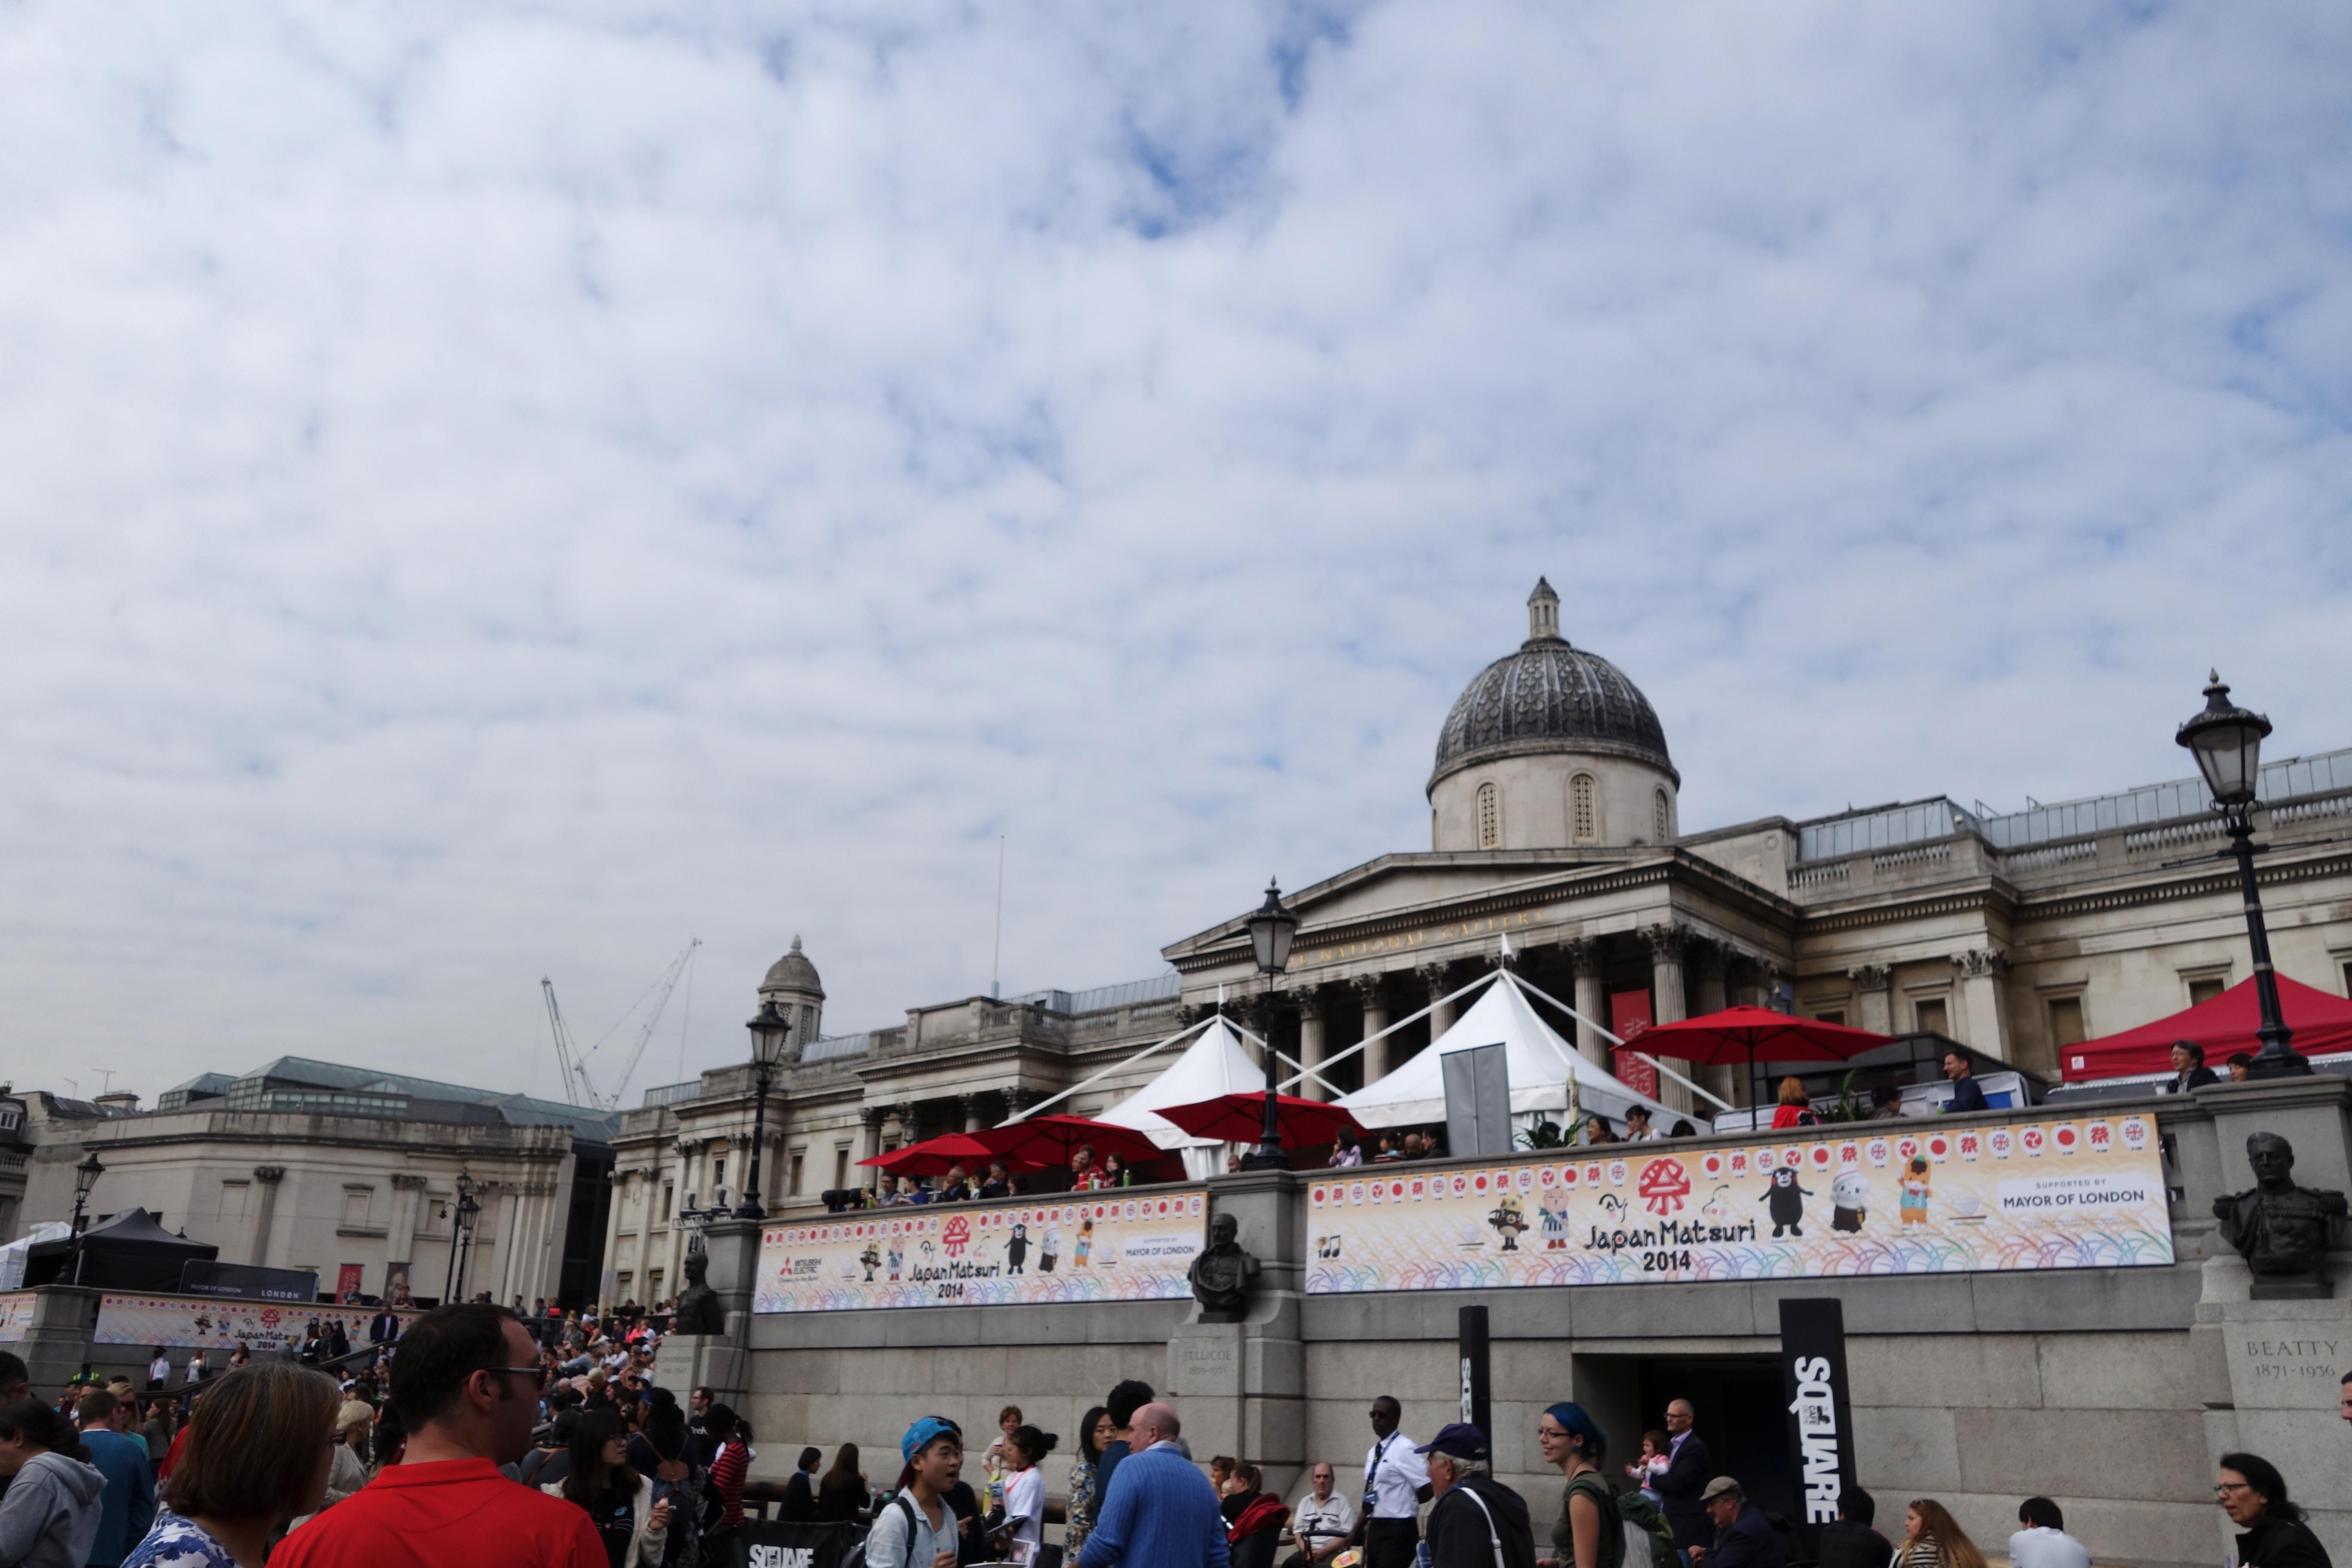 japan matsuri festival trafalgar square 2014